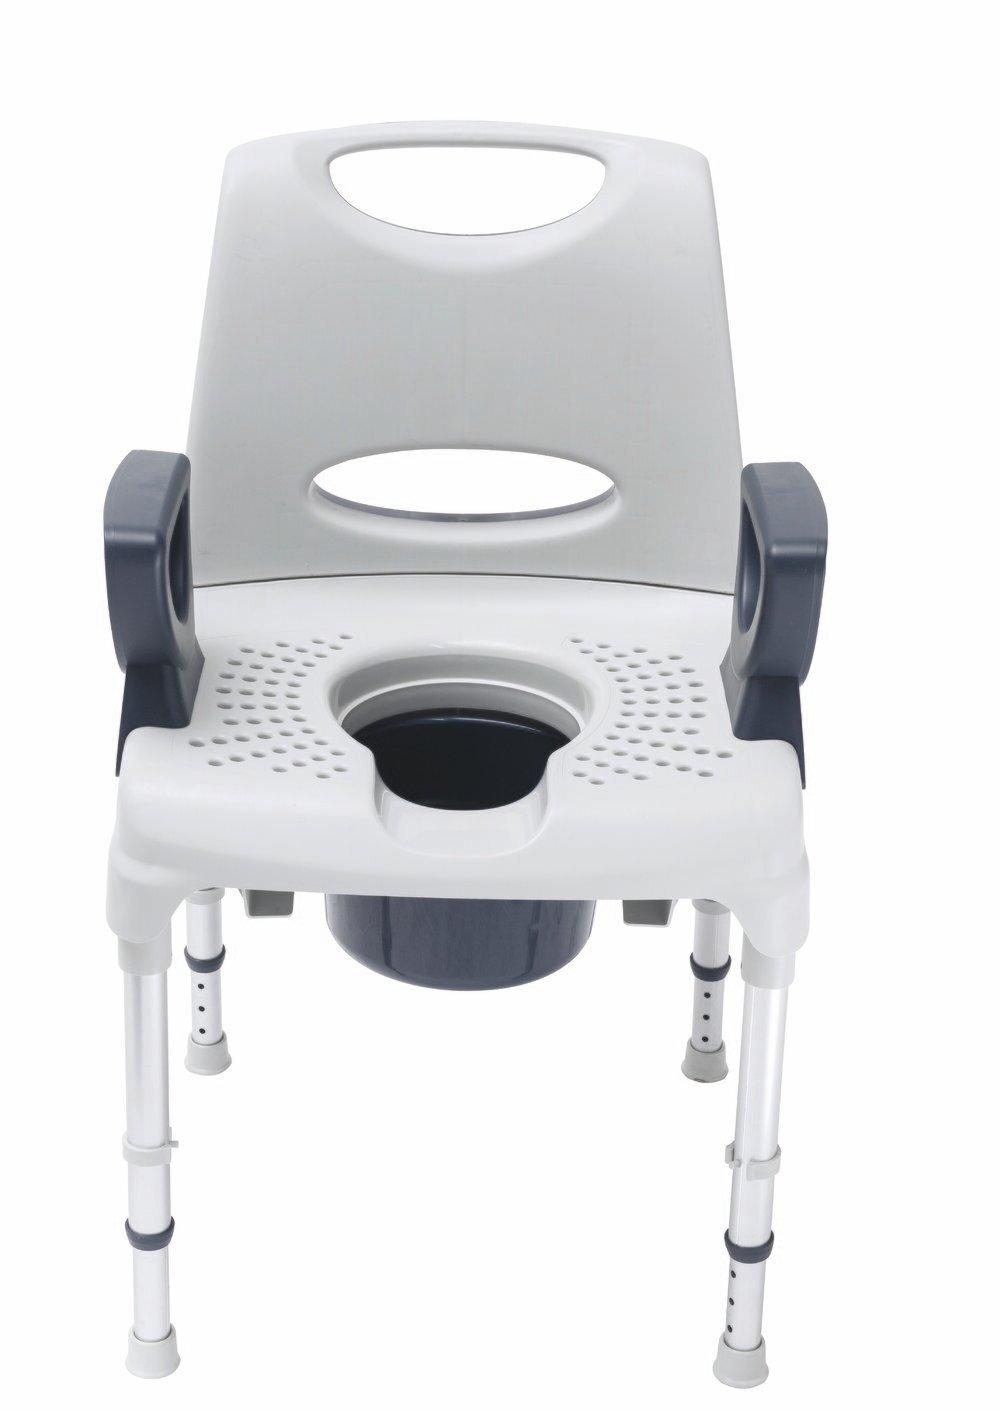 Douche/Toiletstoel AQ-TICA Comfort